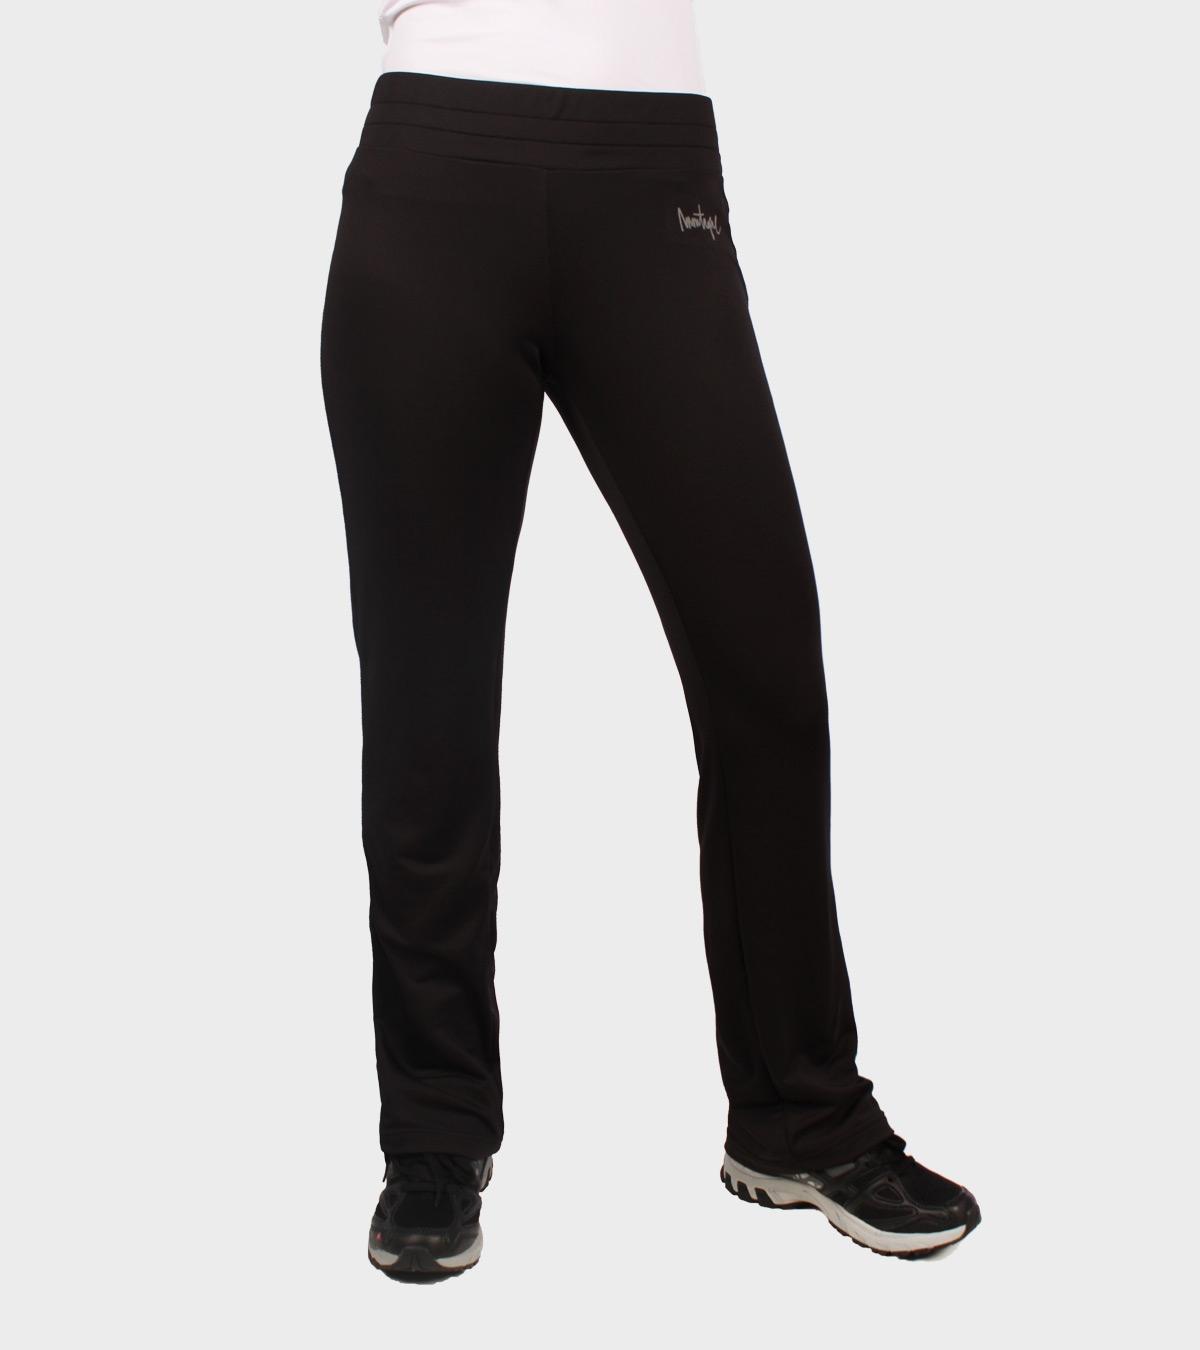 Pantalón deportivo de mujer Belkis